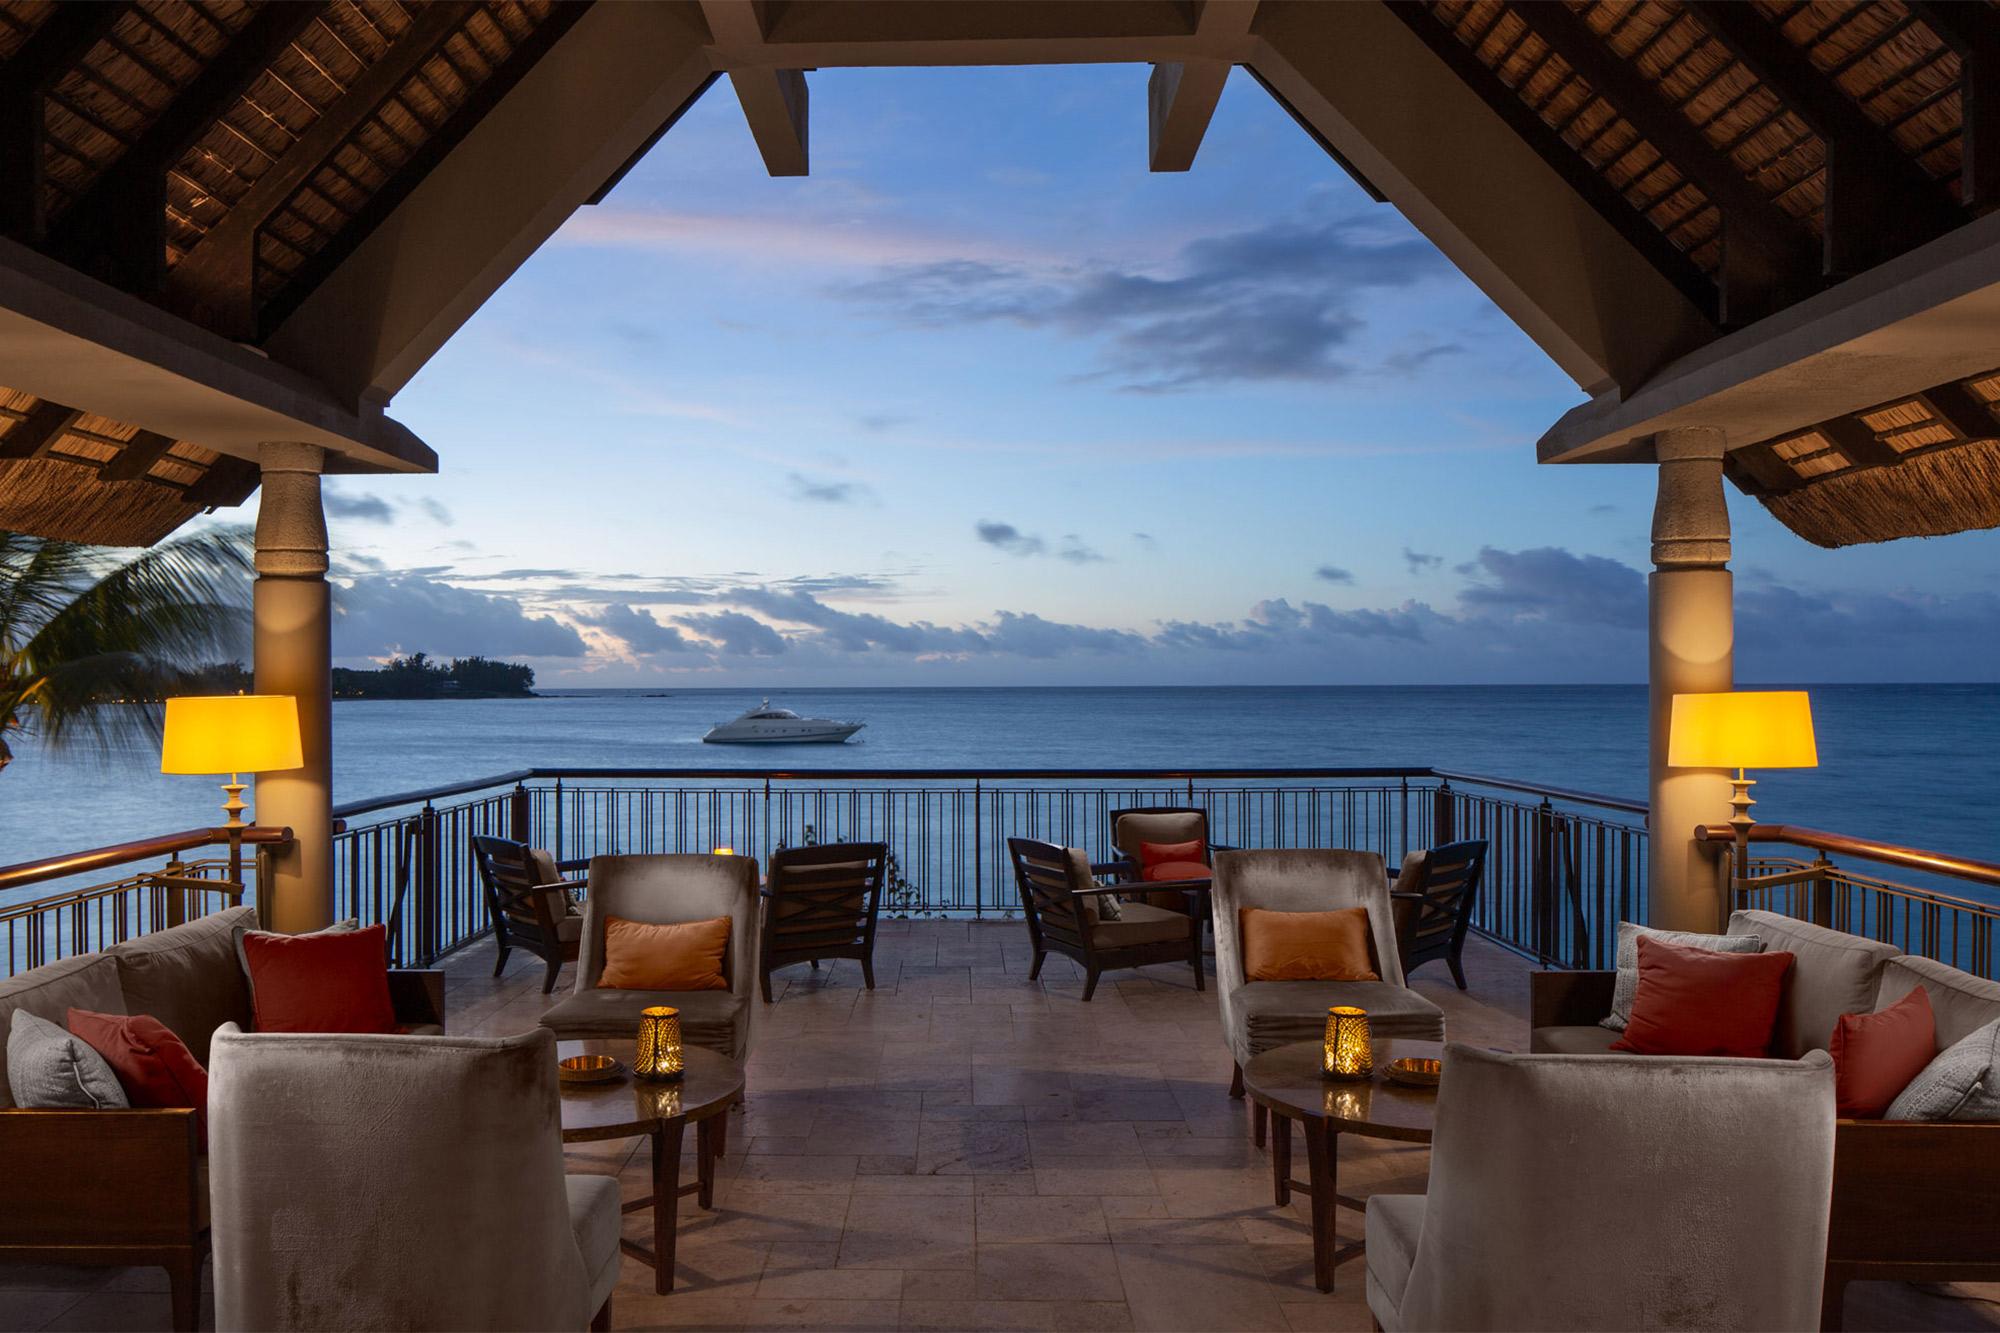 Luxury-bar-Beachcomber-Mauritius-hotel-resort-photography-Adrian-Kilchherr, Africa, Europe, USA Hotel Photographer